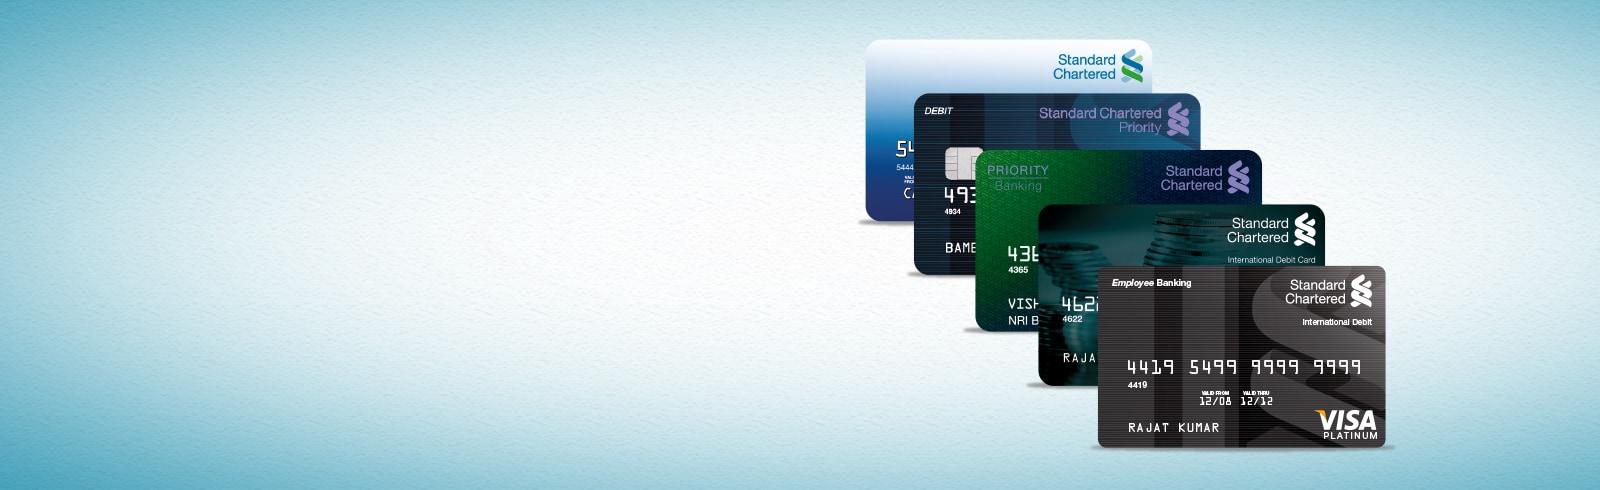 Debit Card PIN – Standard Chartered India